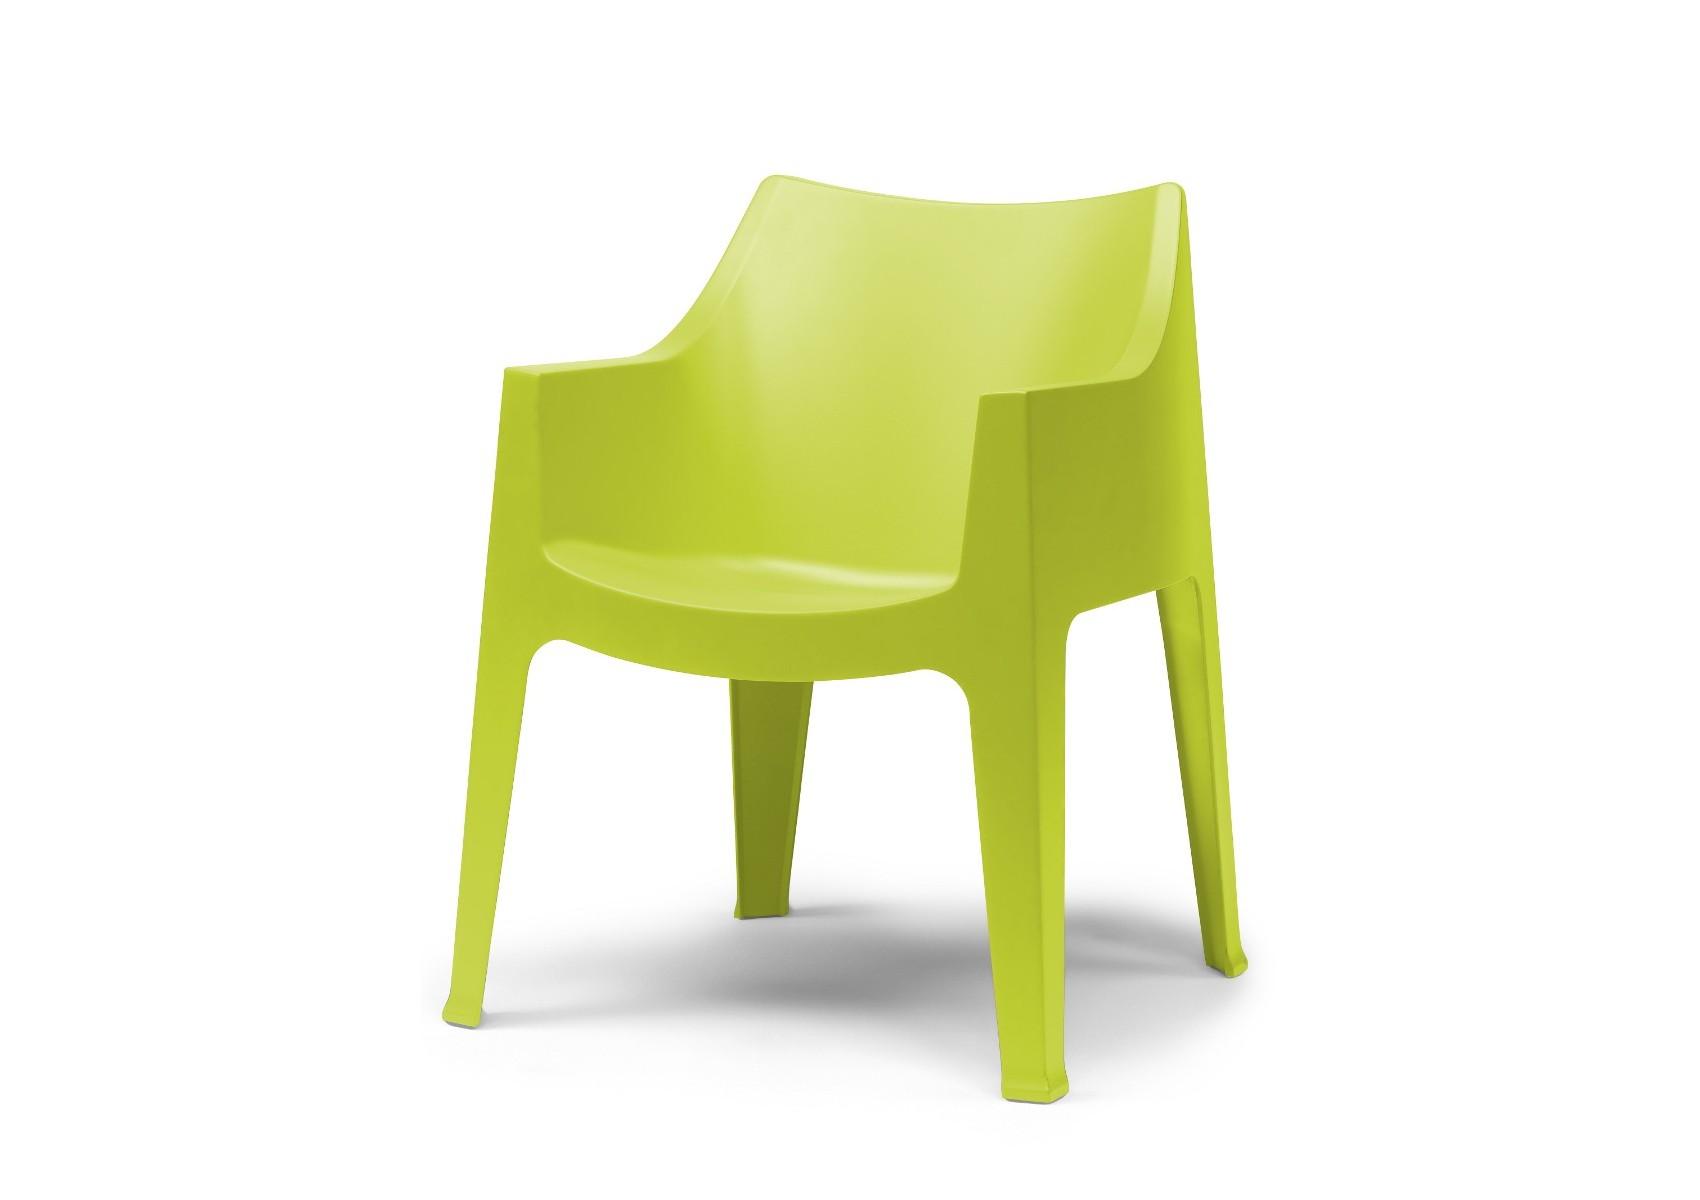 fauteuils design de jardin coccolona par scab design. Black Bedroom Furniture Sets. Home Design Ideas